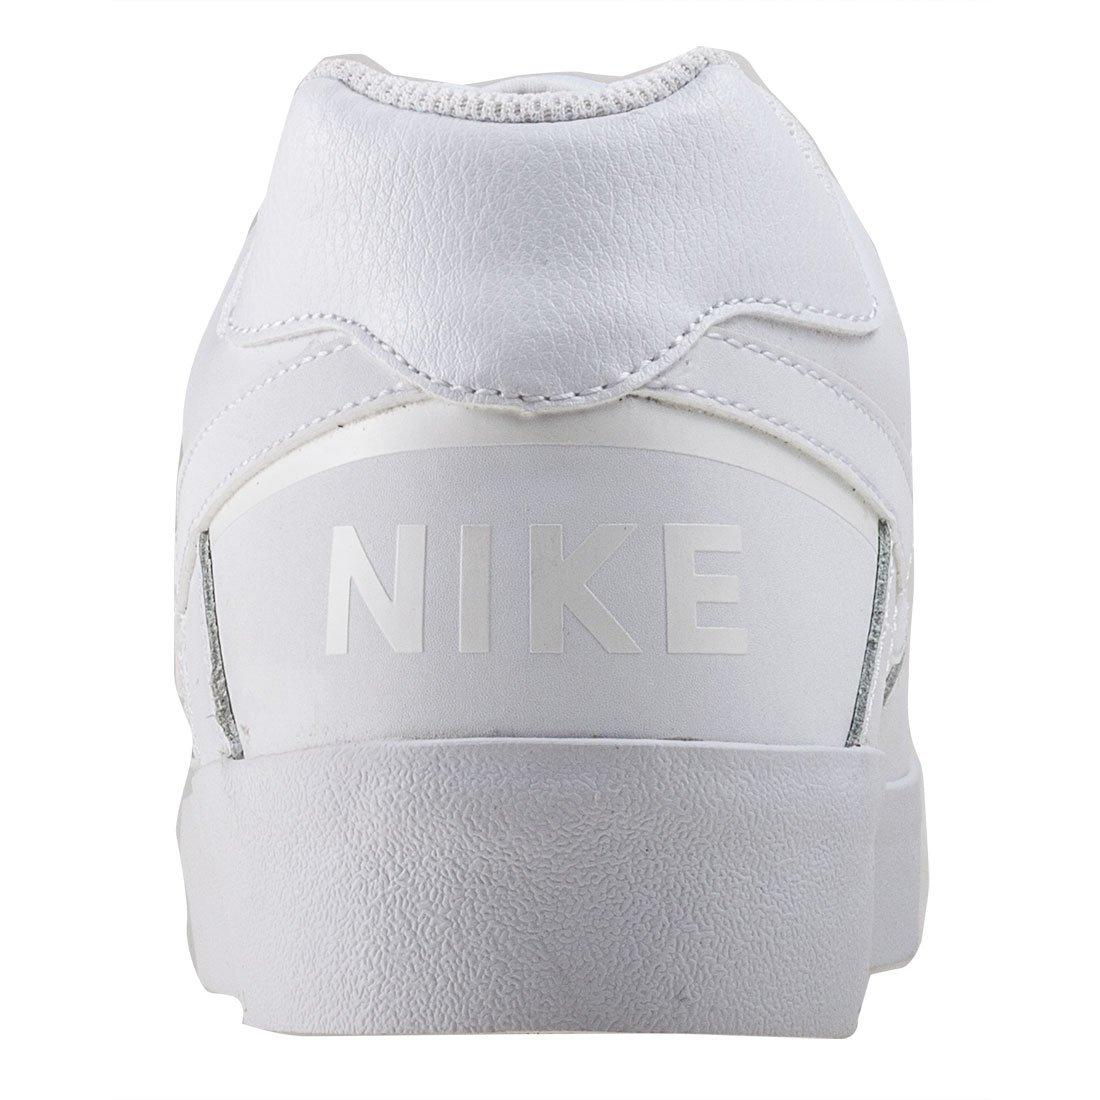 top fashion bdad1 28233 Nike SB SB SB Delta Force Vulc - Scarpe da Skateboard Uomo B012J19HWE 39.5  EU Bianco (bianca ...